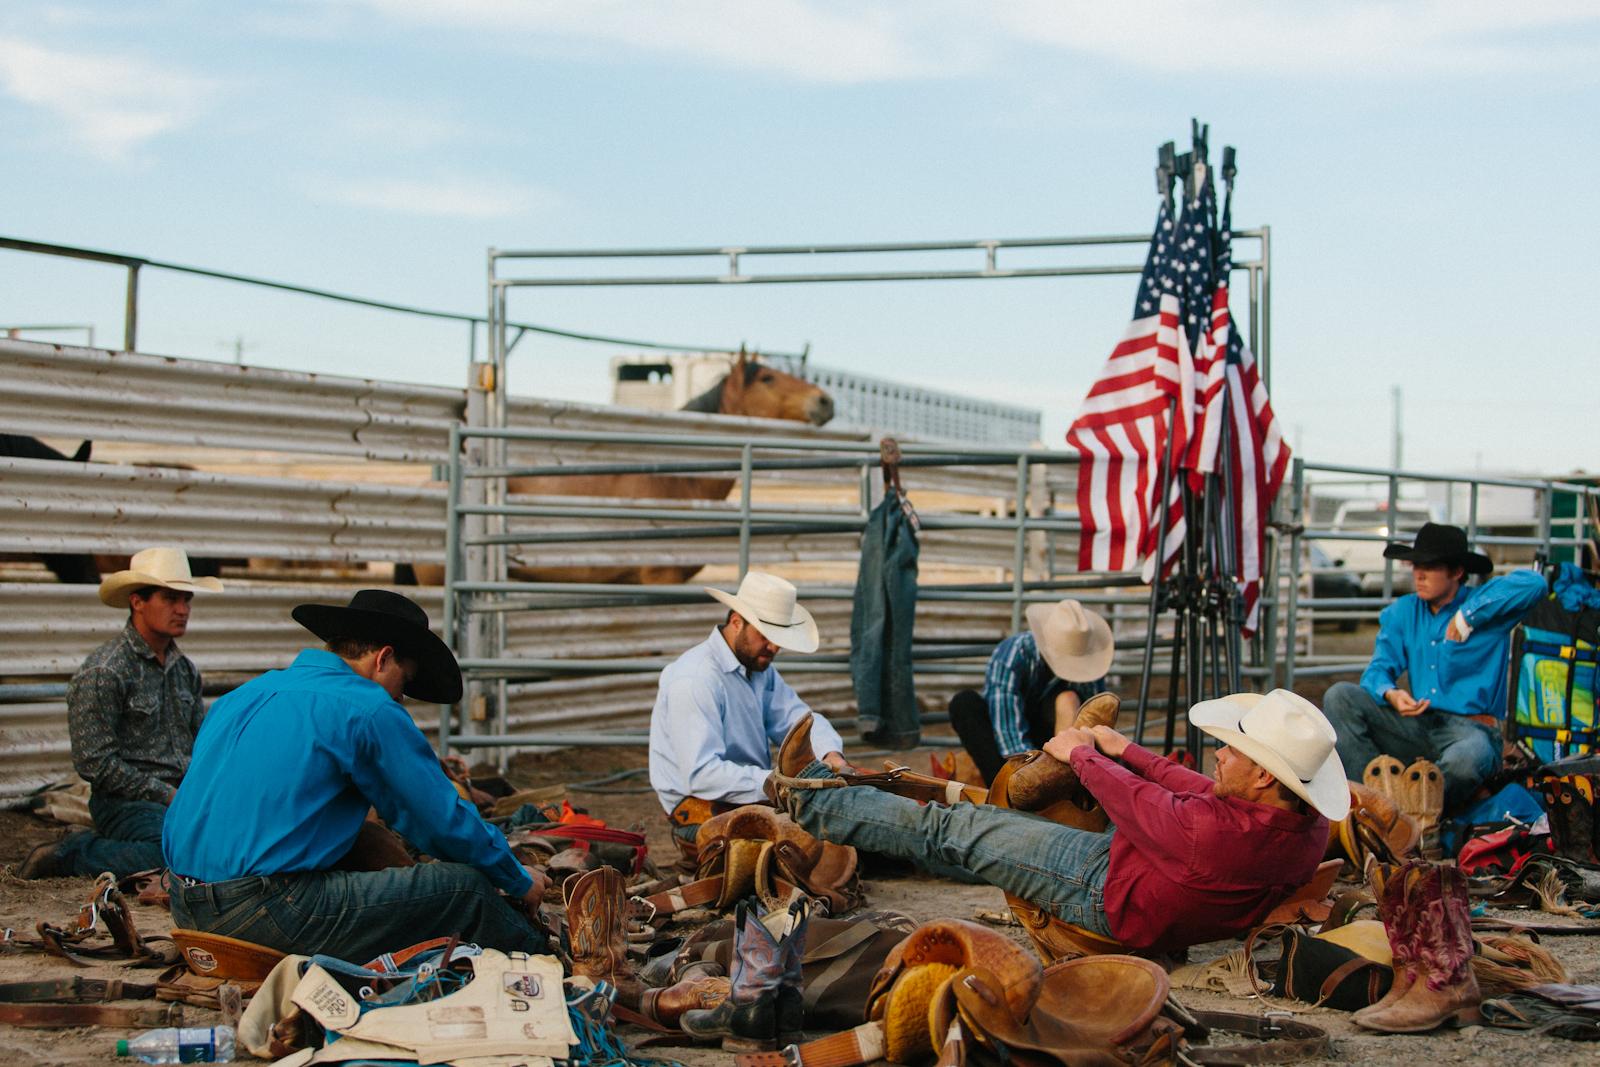 rodeo-11.jpg